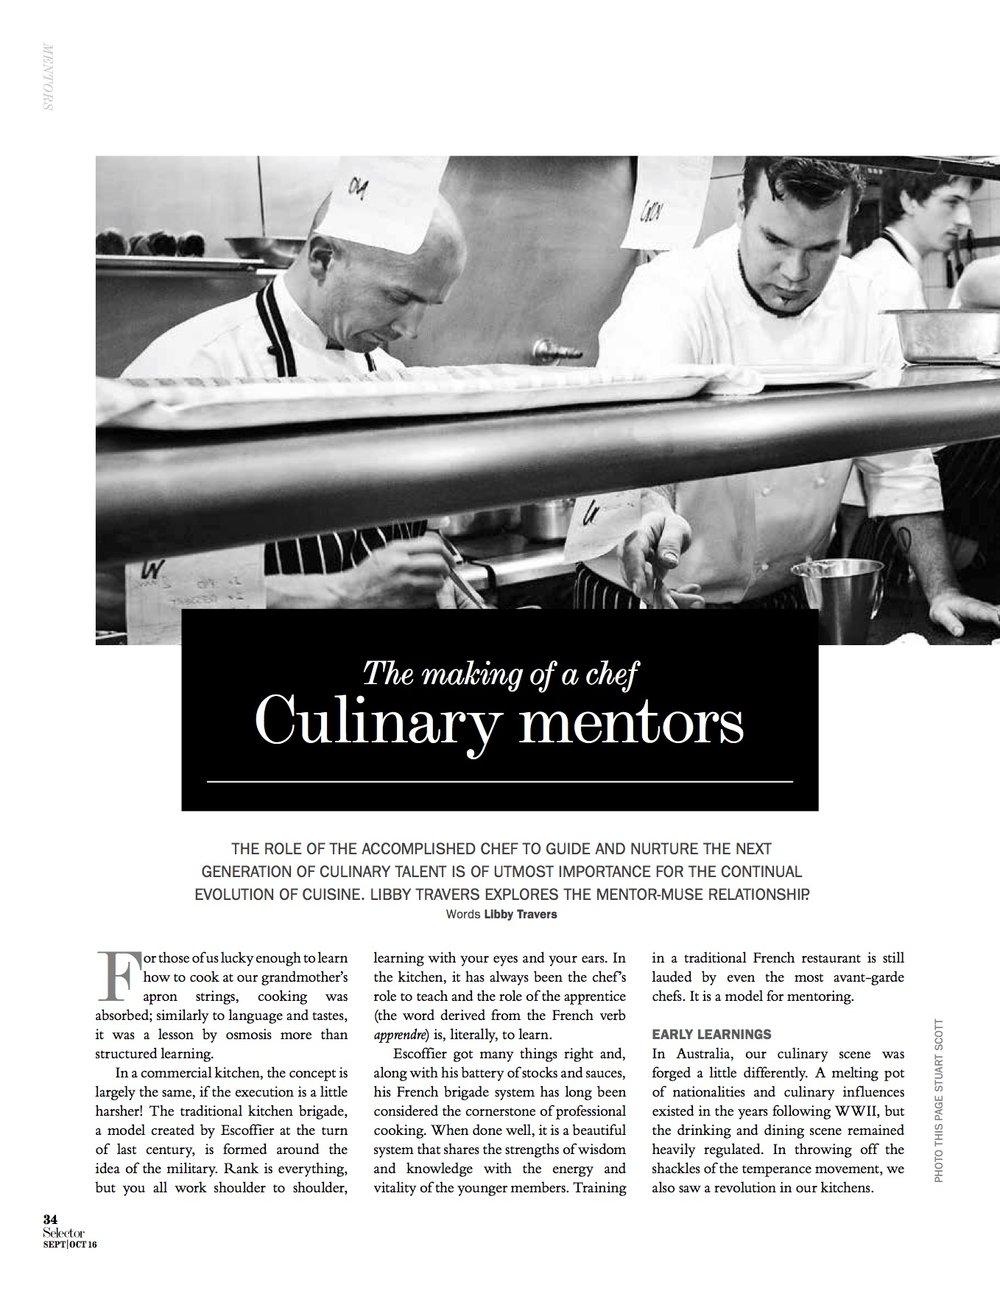 CulinaryMentors1.jpg